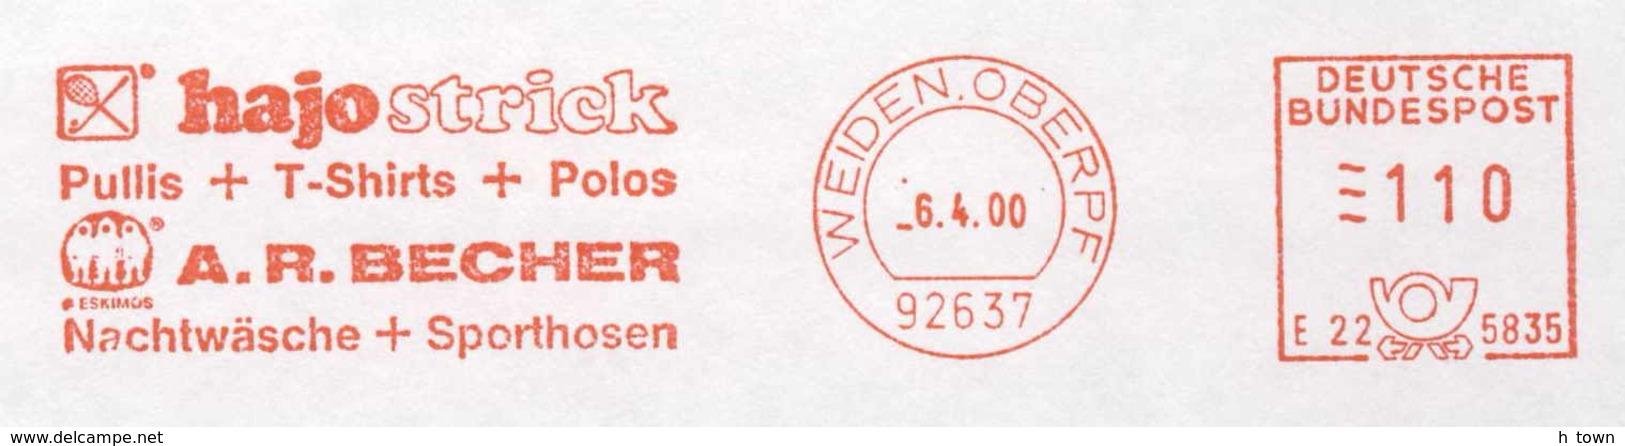 929  Tennis, Golf, Textile: Ema D'Allemagne, 2000 - Meter Stamp From Weiden, Germany - Tennis